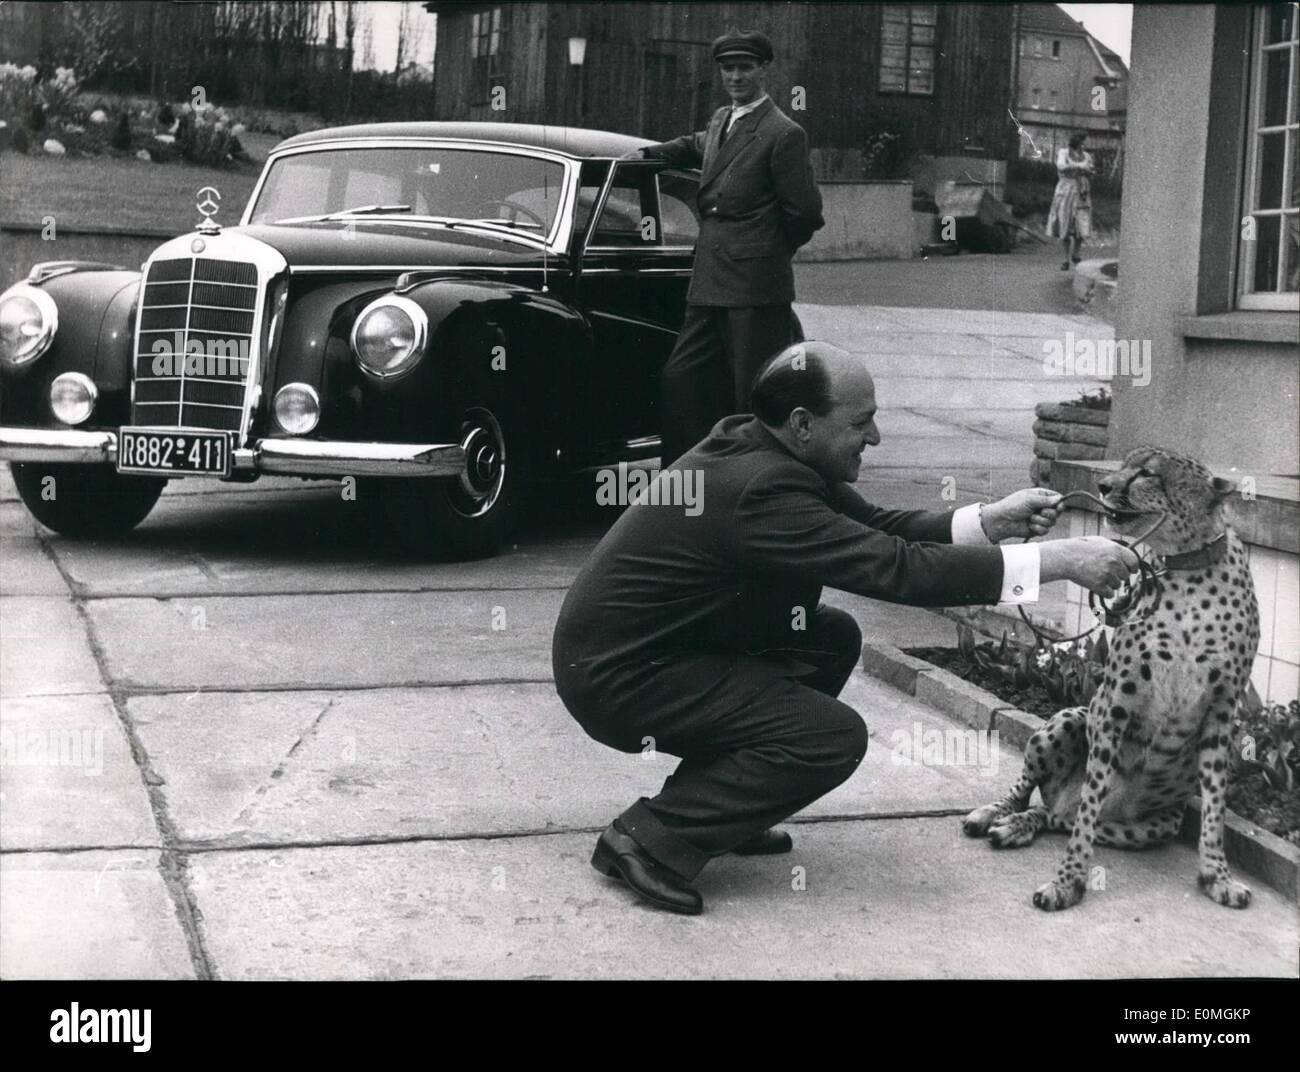 Cabina Armadio Piccola Wuppertal : 000 dm immagini & 000 dm fotos stock alamy